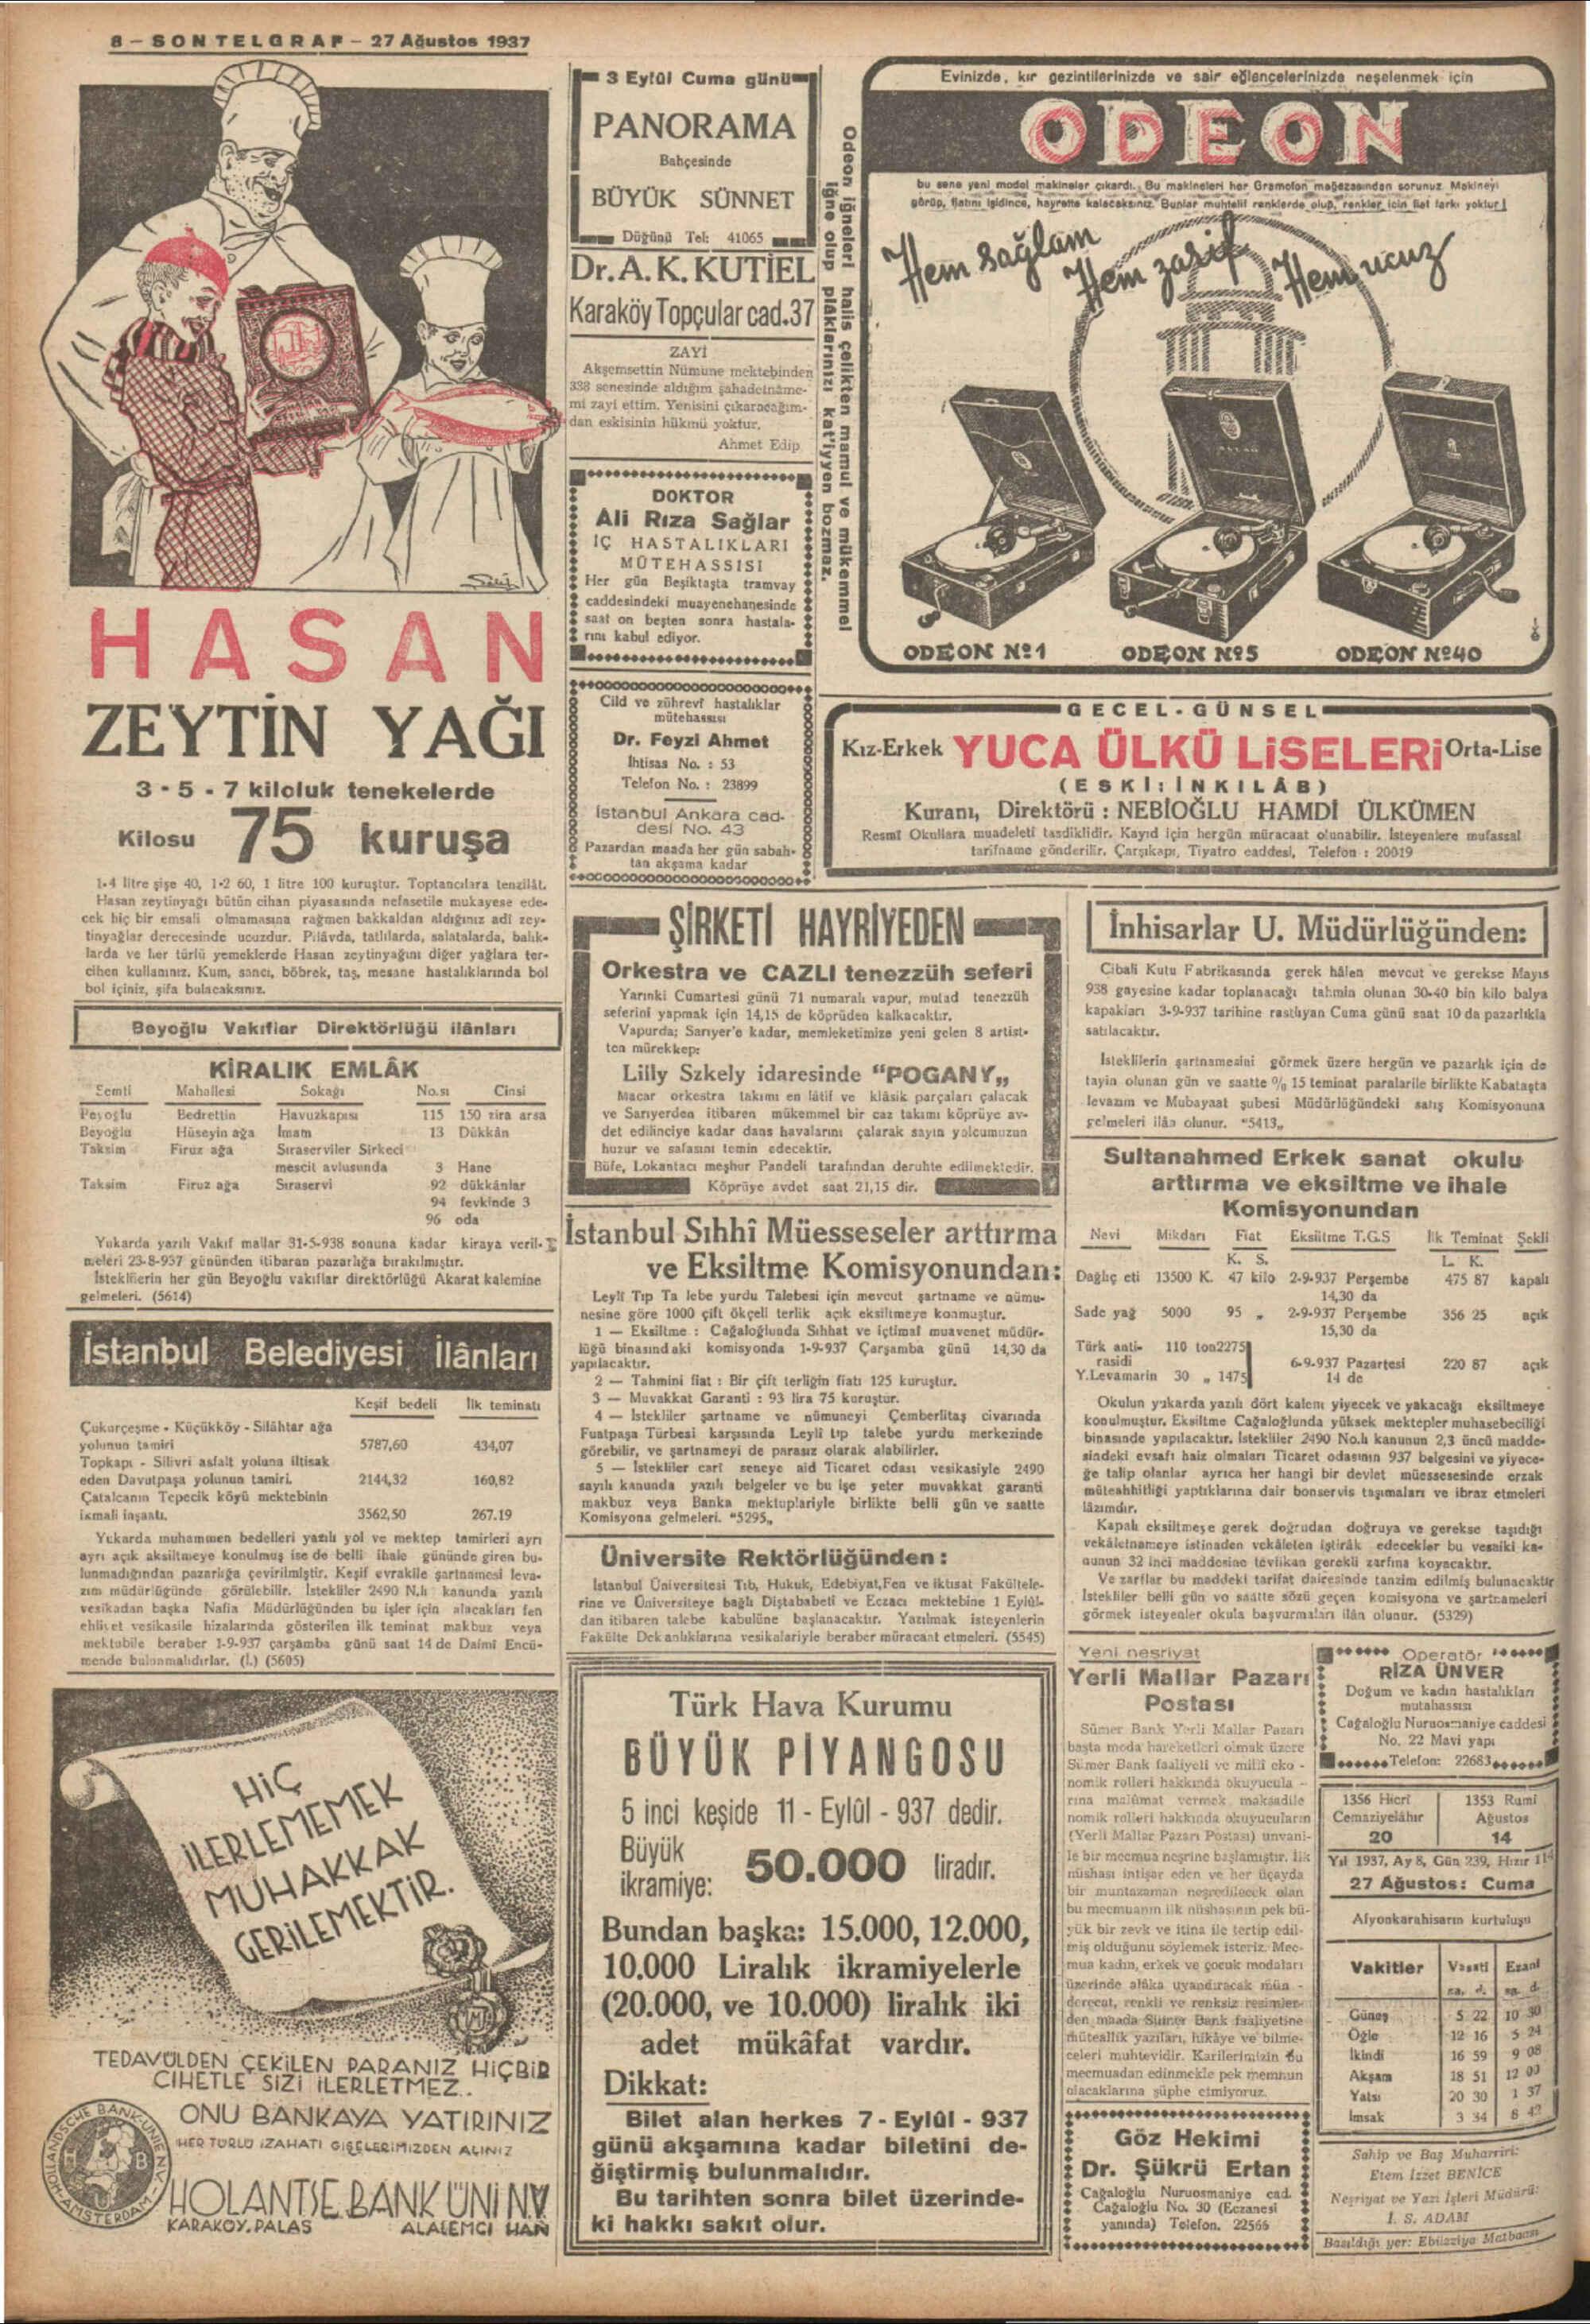 August 27, 1937 Tarihli Son Telgraf Dergisi Sayfa 8